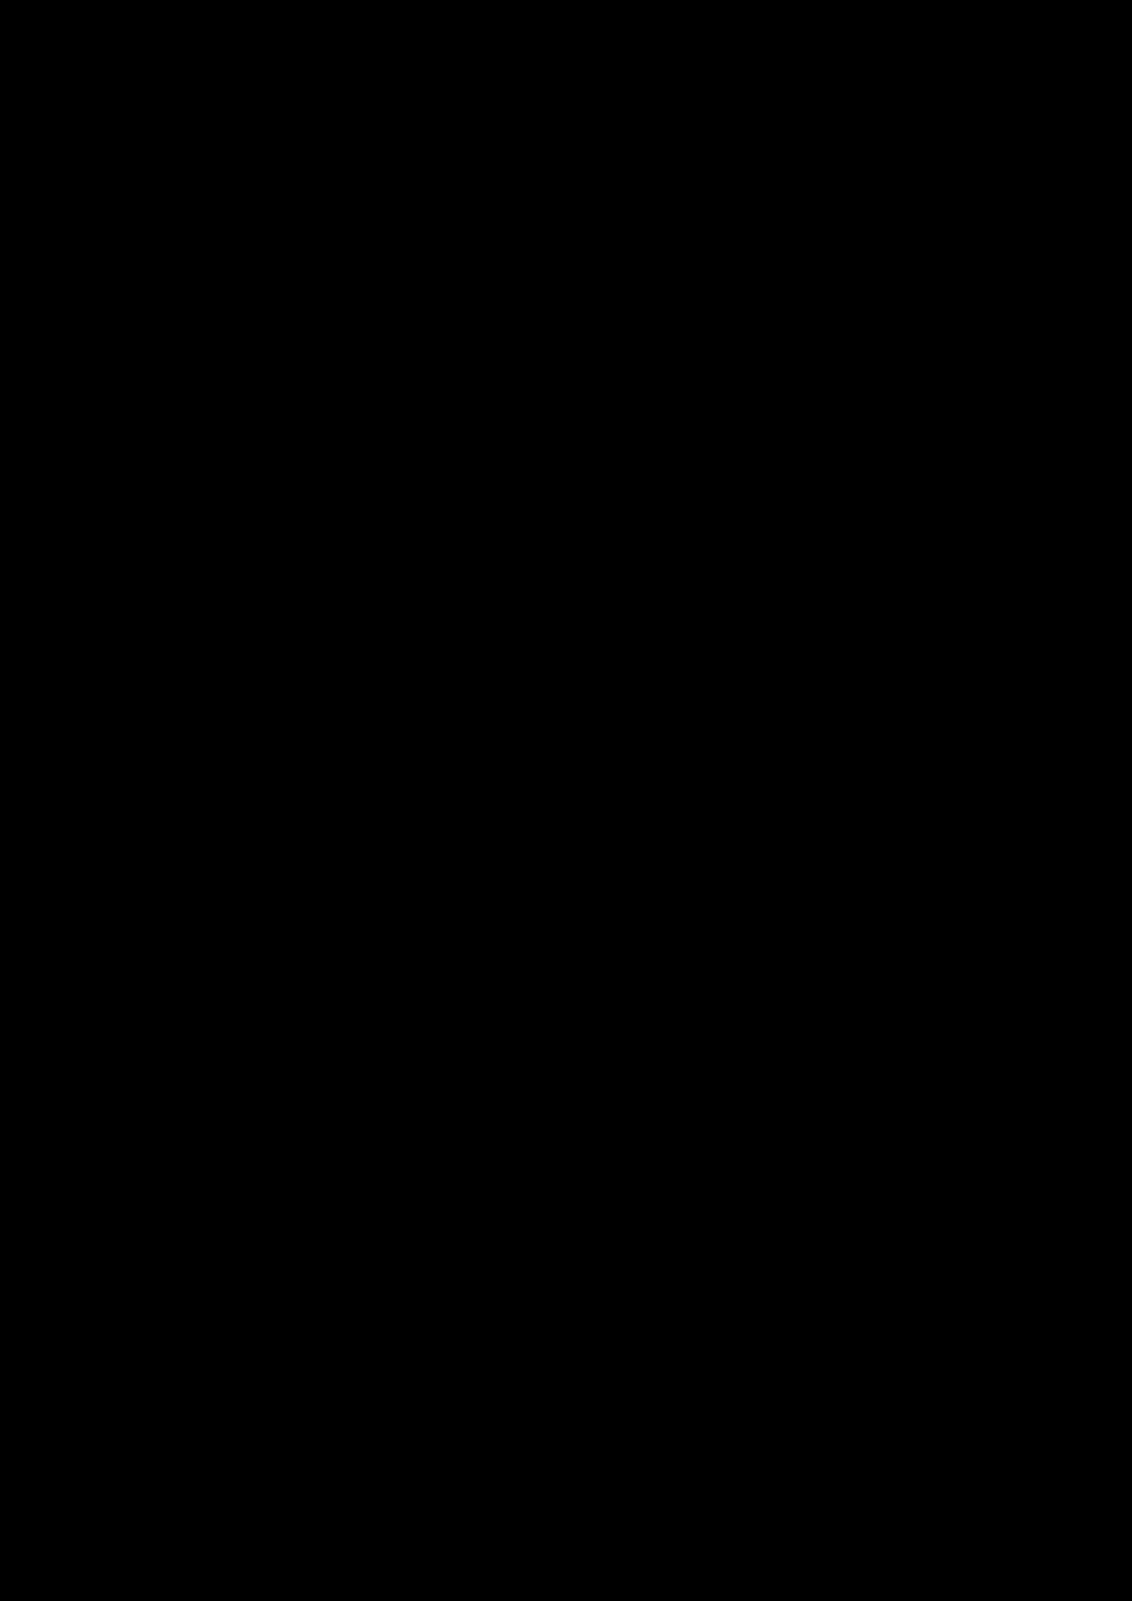 Romans o sleze slide, Image 33